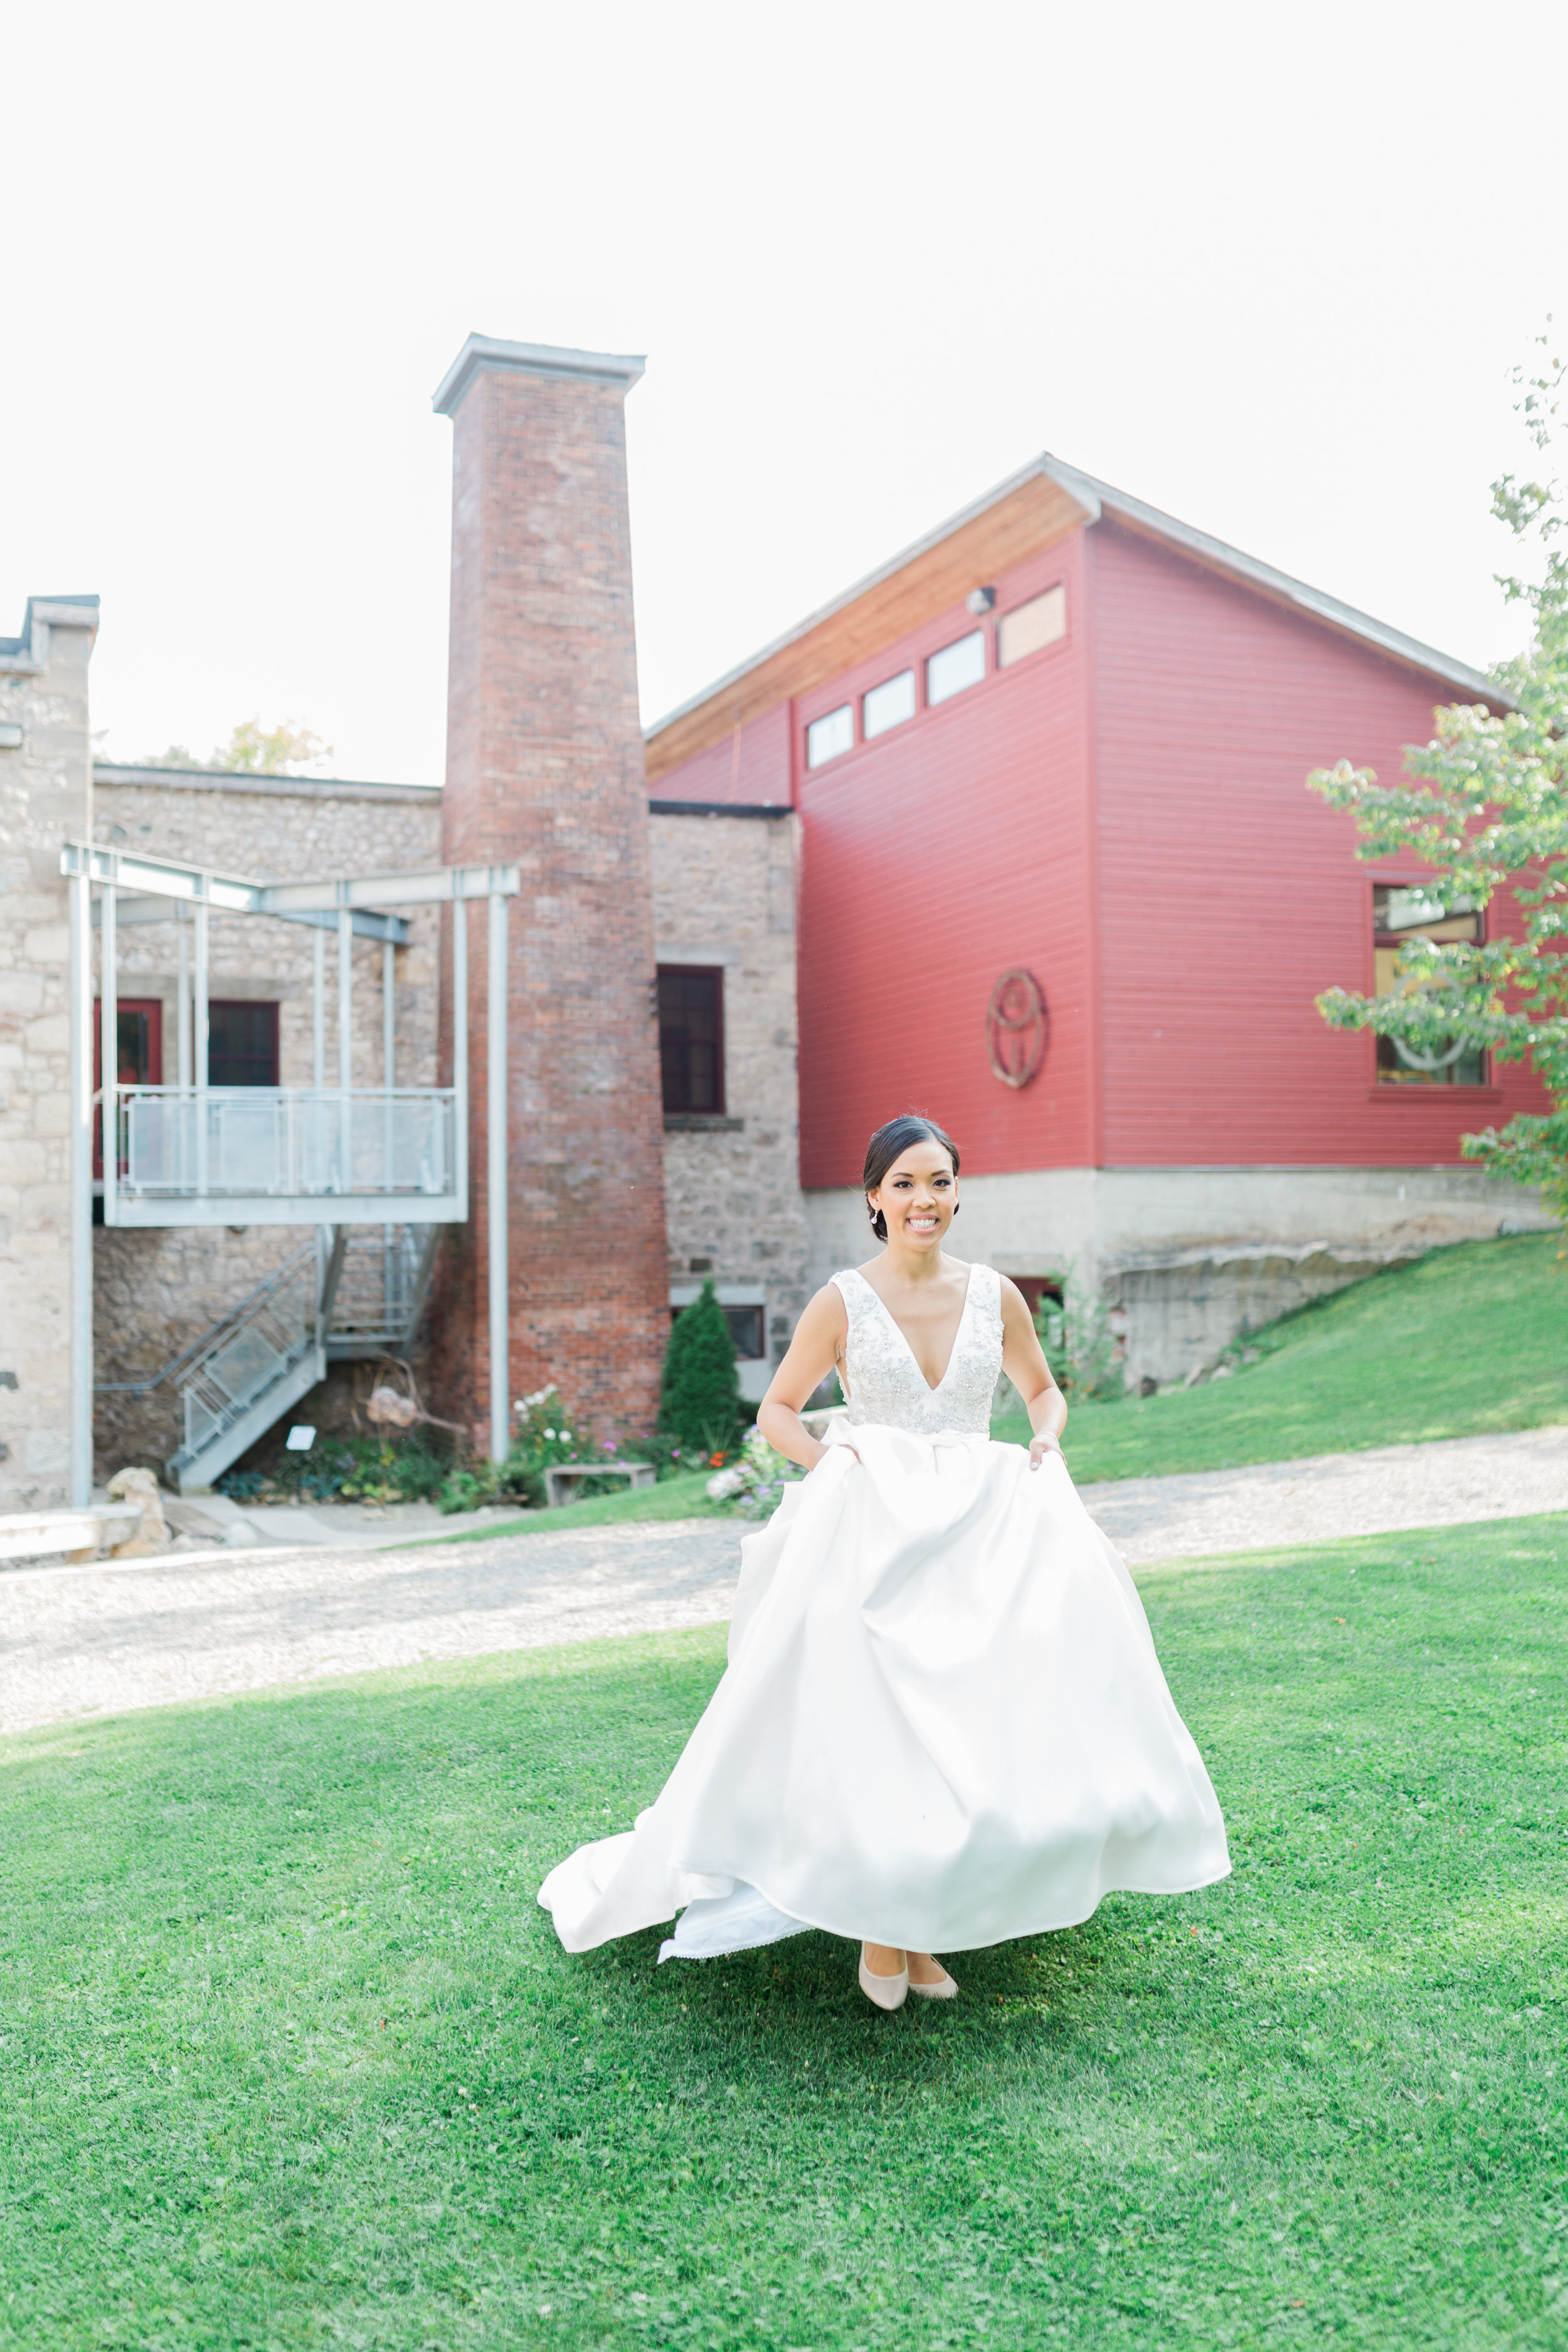 Alton Mills Wedding - First Look-4.jpg